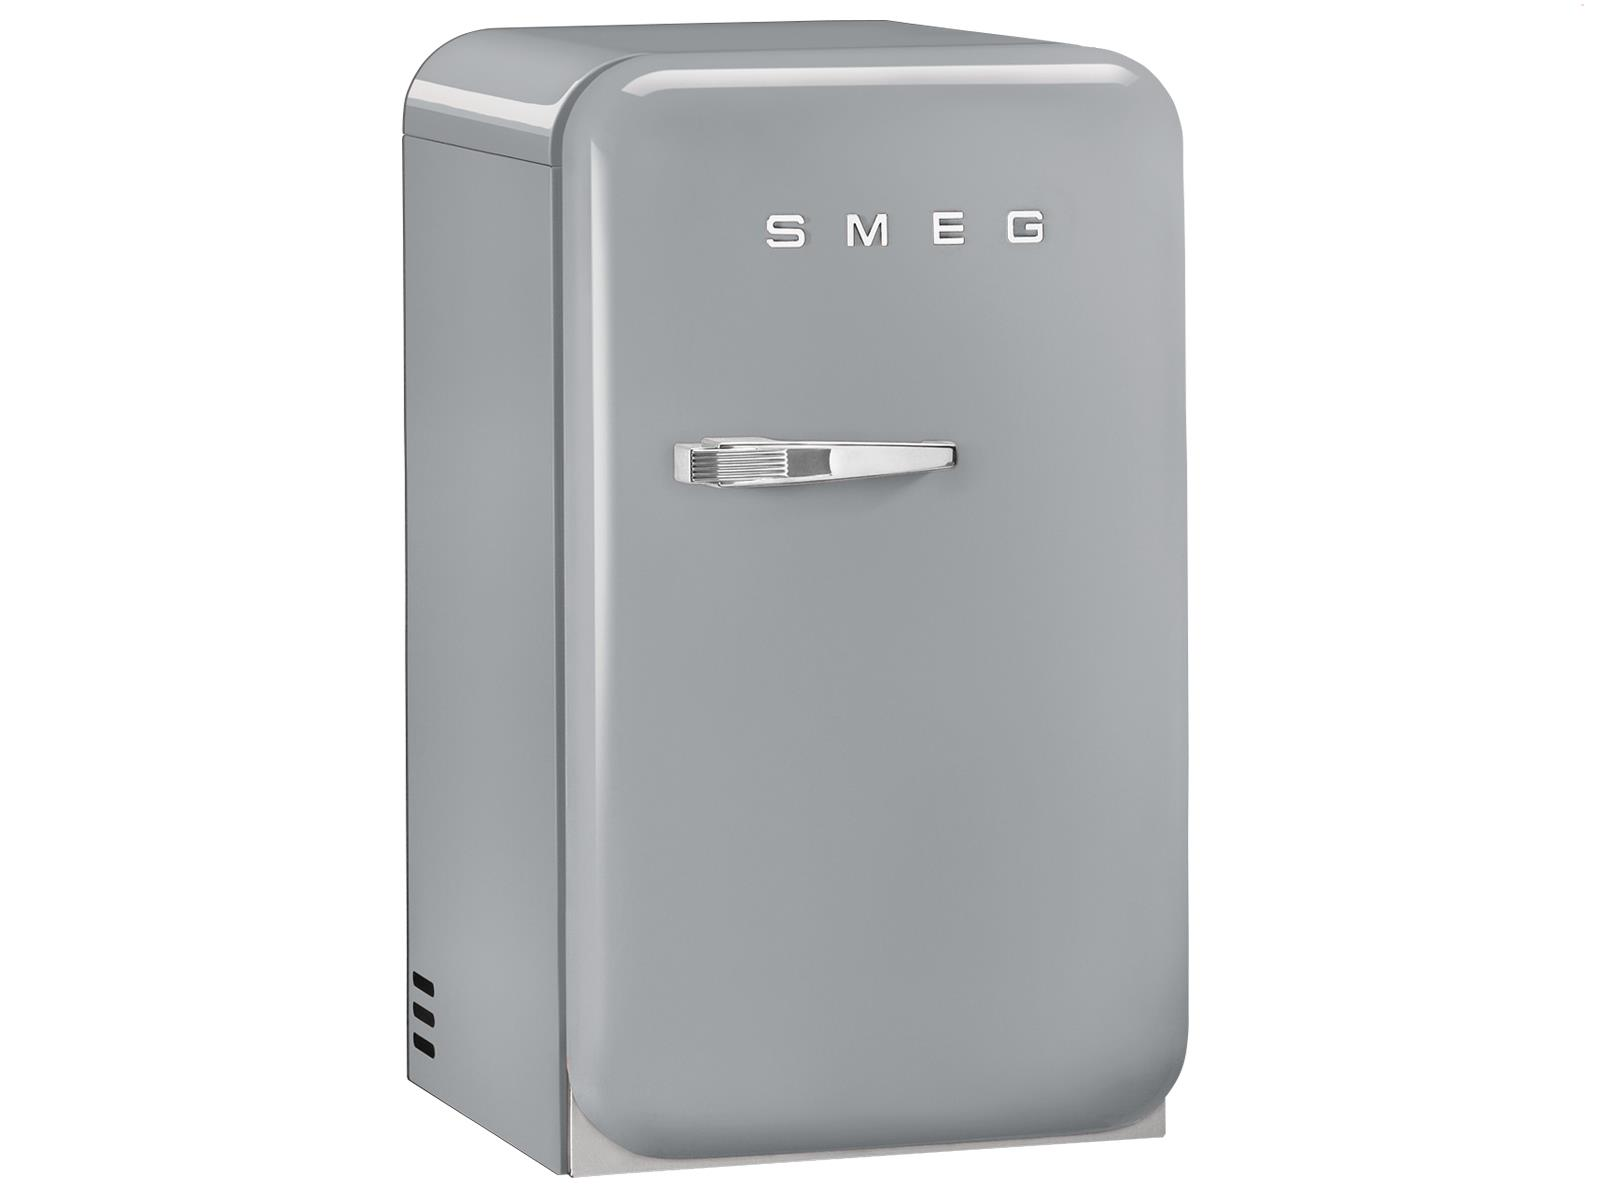 Smeg Kühlschrank Macht Geräusche : Smeg fab rsv standkühlschrank polarsilber metallic